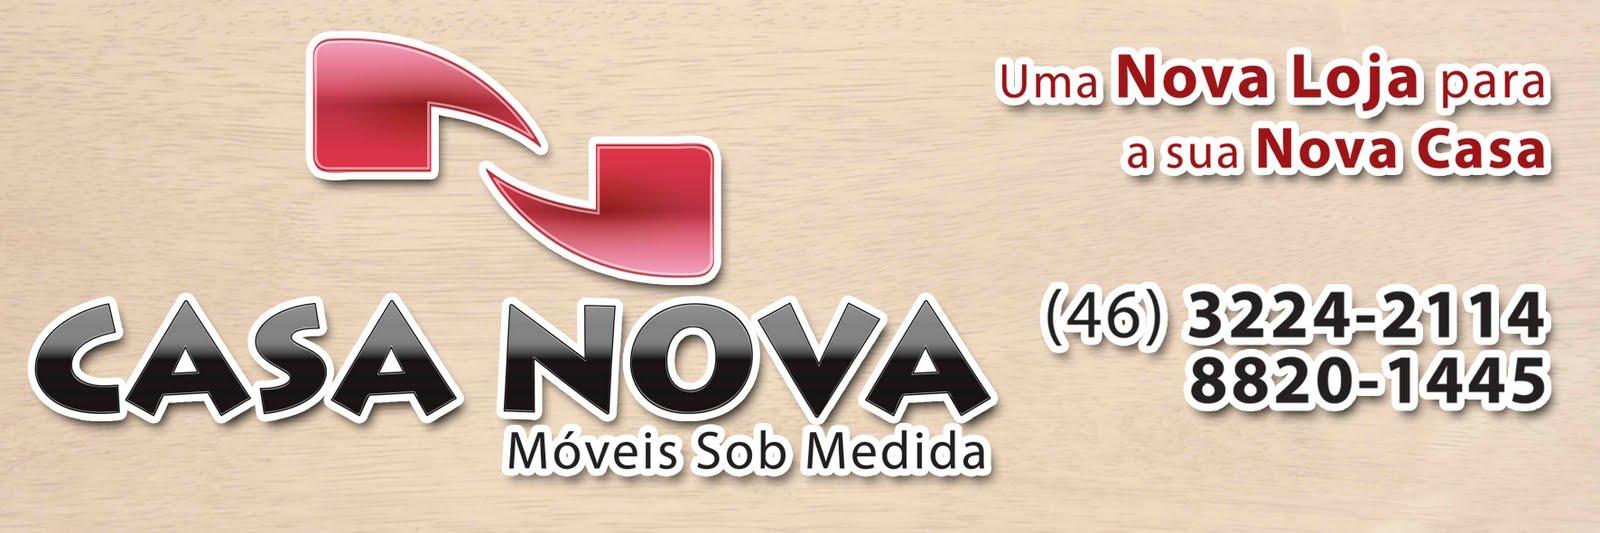 CASA NOVA MÓVEIS SOB MEDIDA